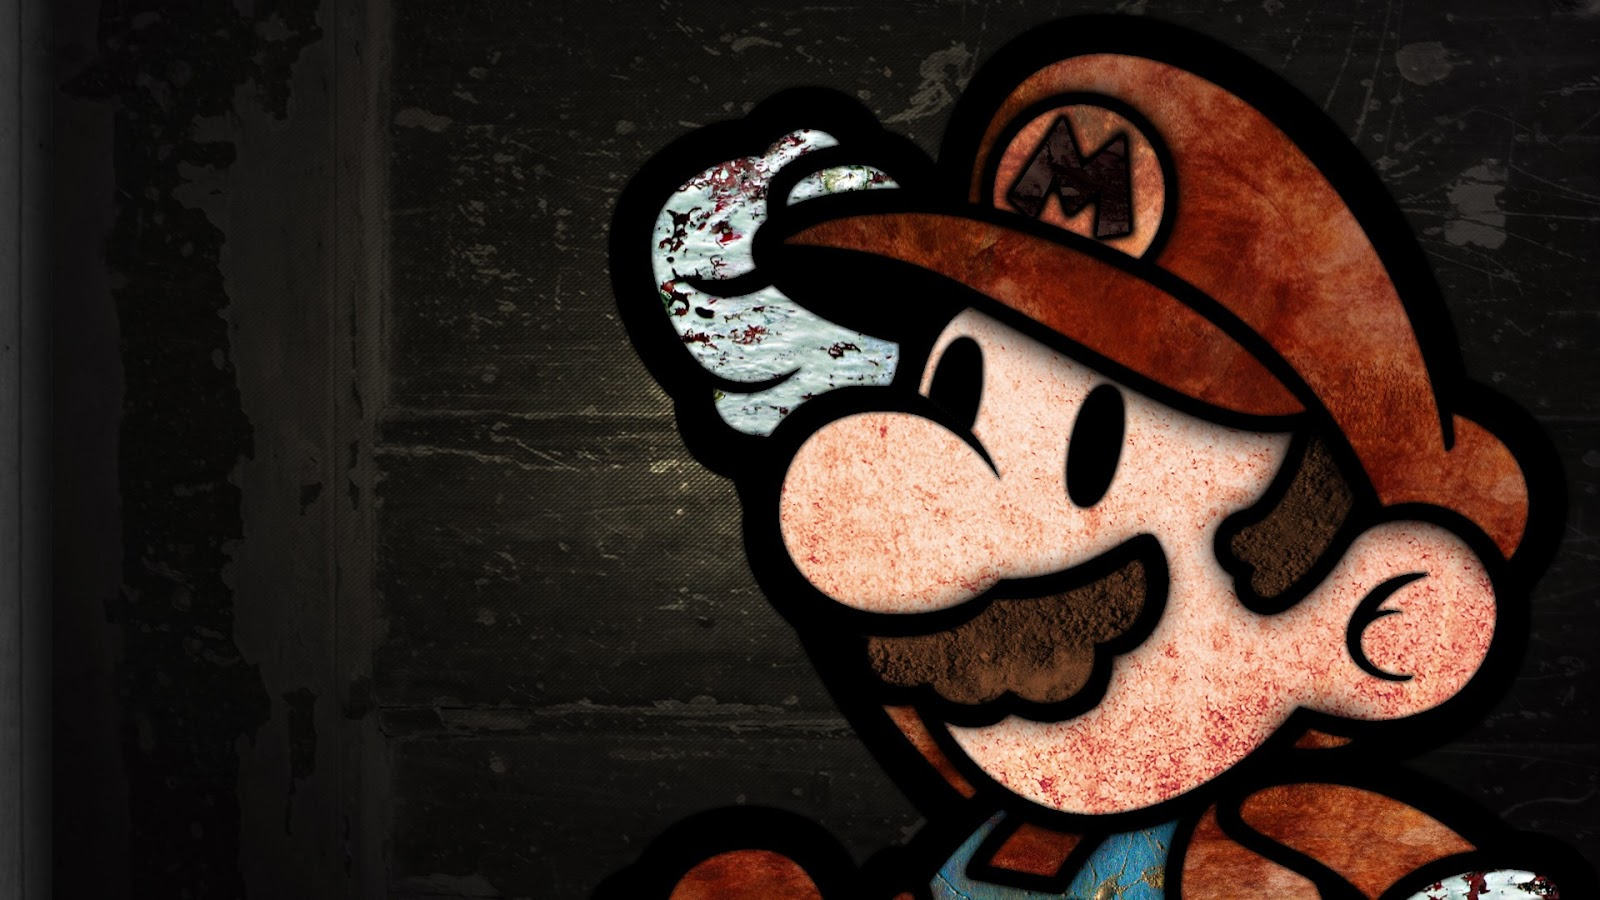 http://1.bp.blogspot.com/-EmI2nlDWb5I/UM-1LokTXFI/AAAAAAAABbQ/wJDY_Z7tPJo/s1600/Mario-mario-wallpaper-hd.jpg